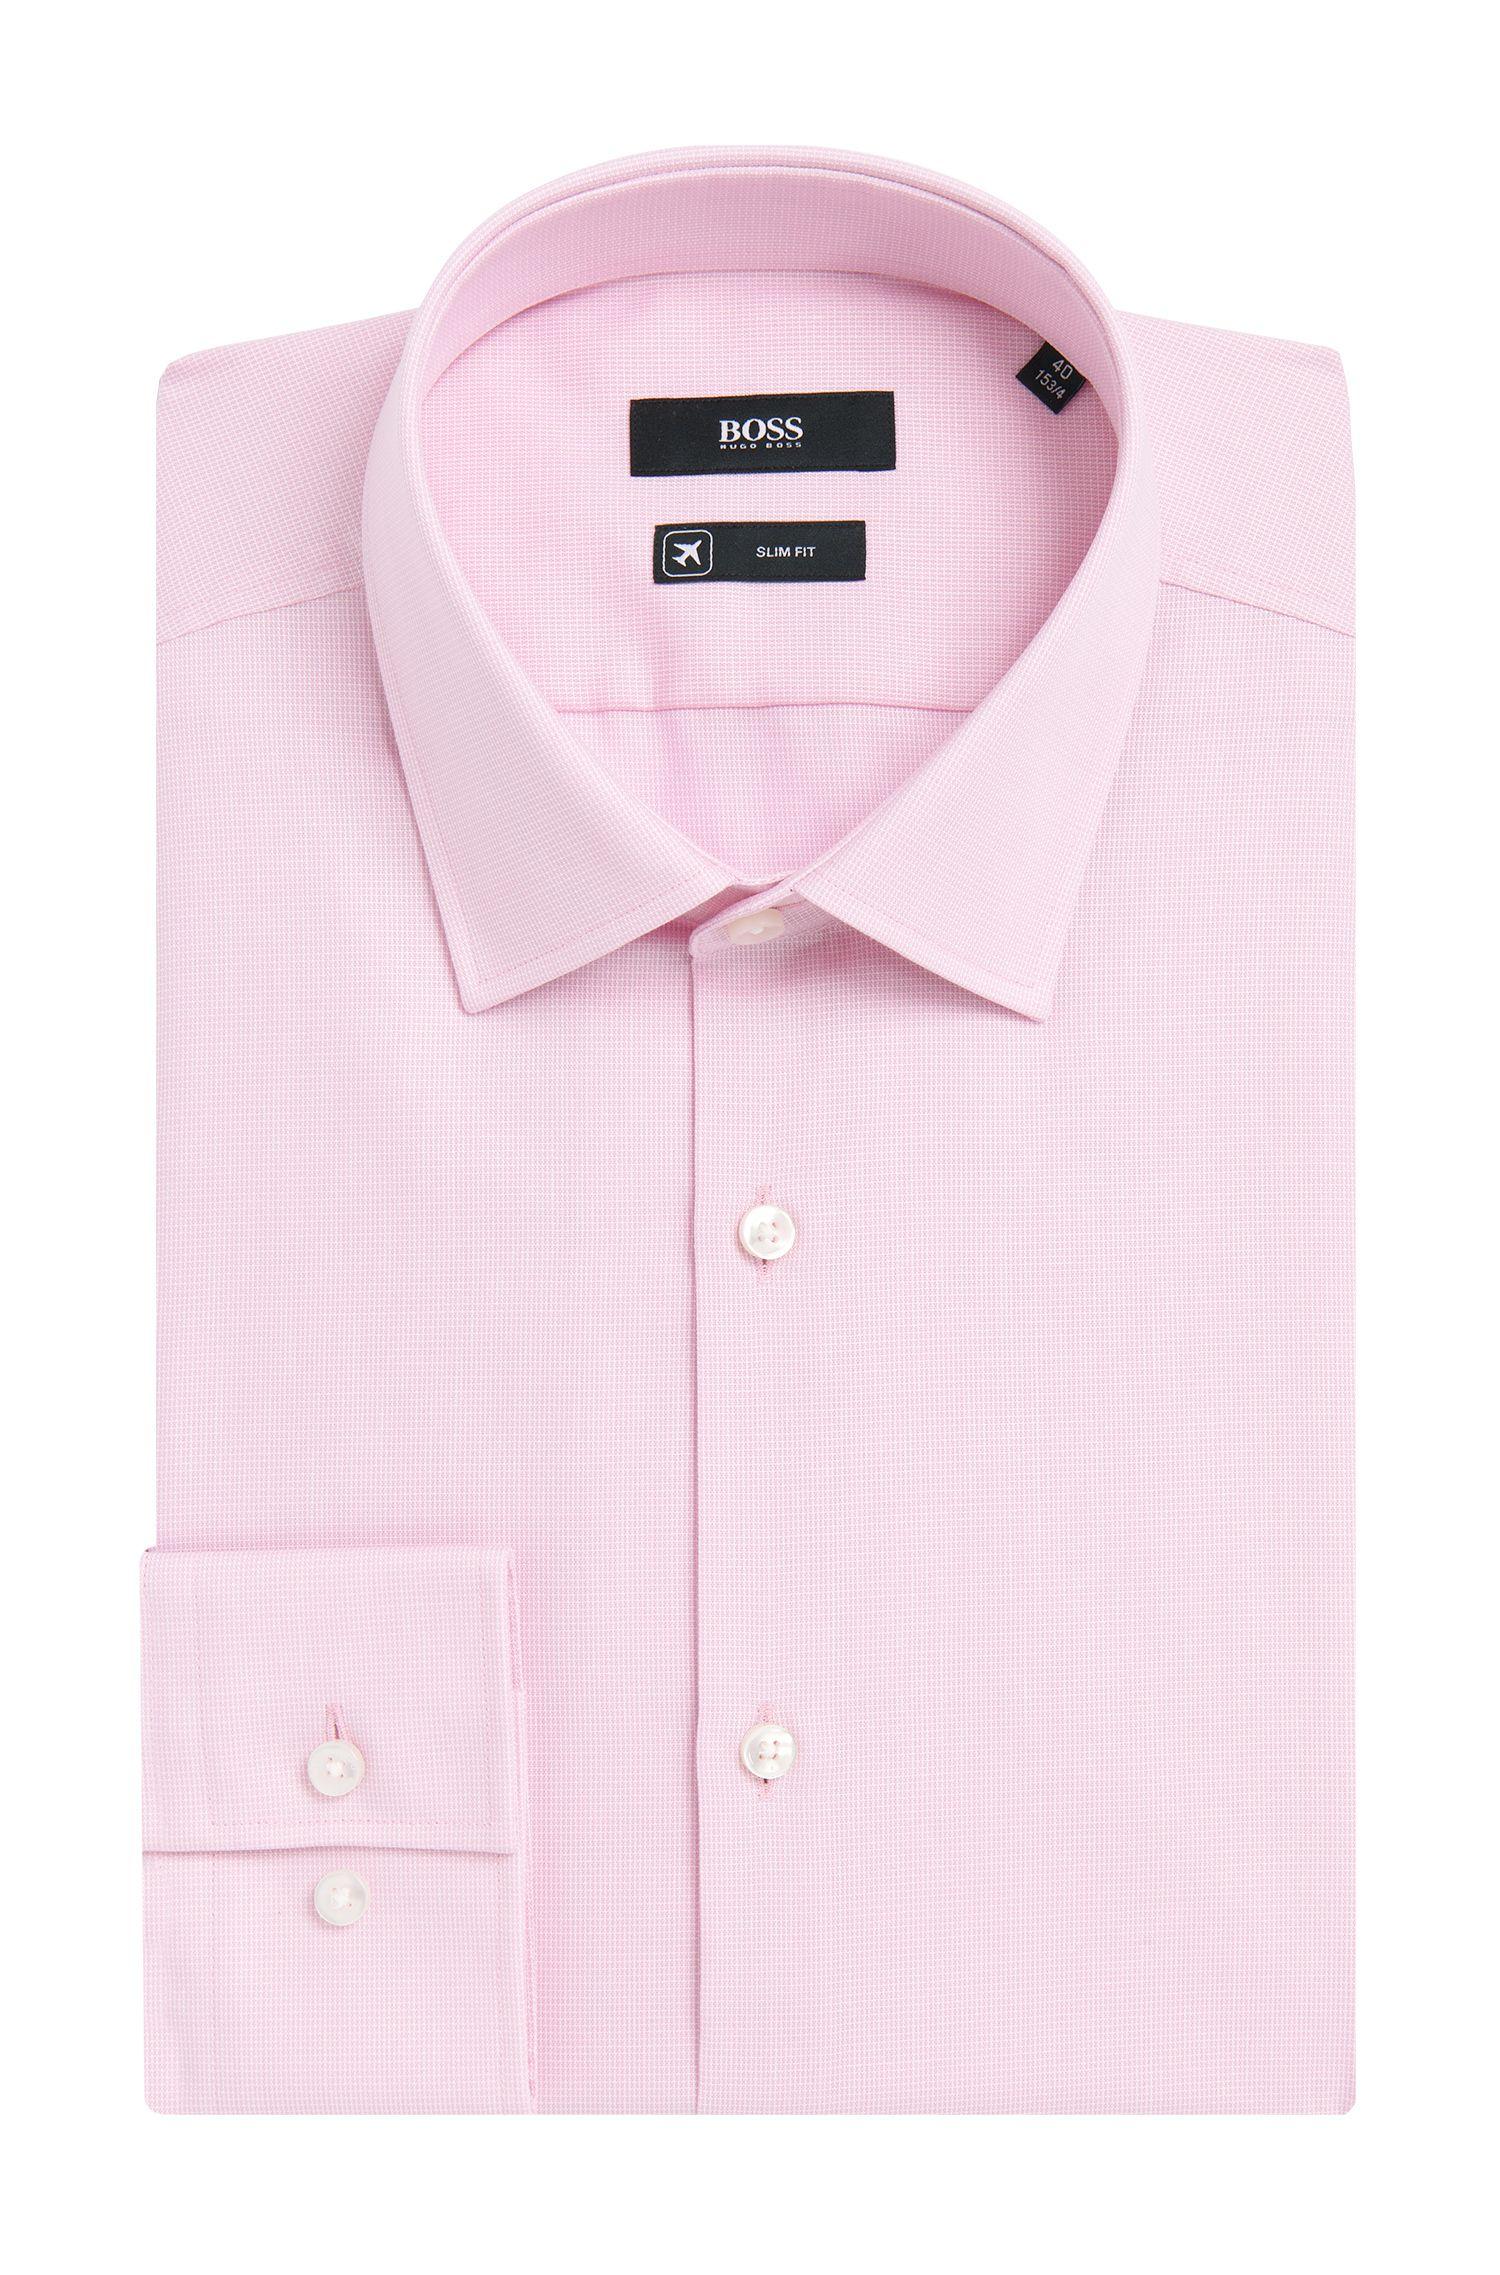 'Jenno'   Slim Fit, Fresh Active Traveler Dress Shirt